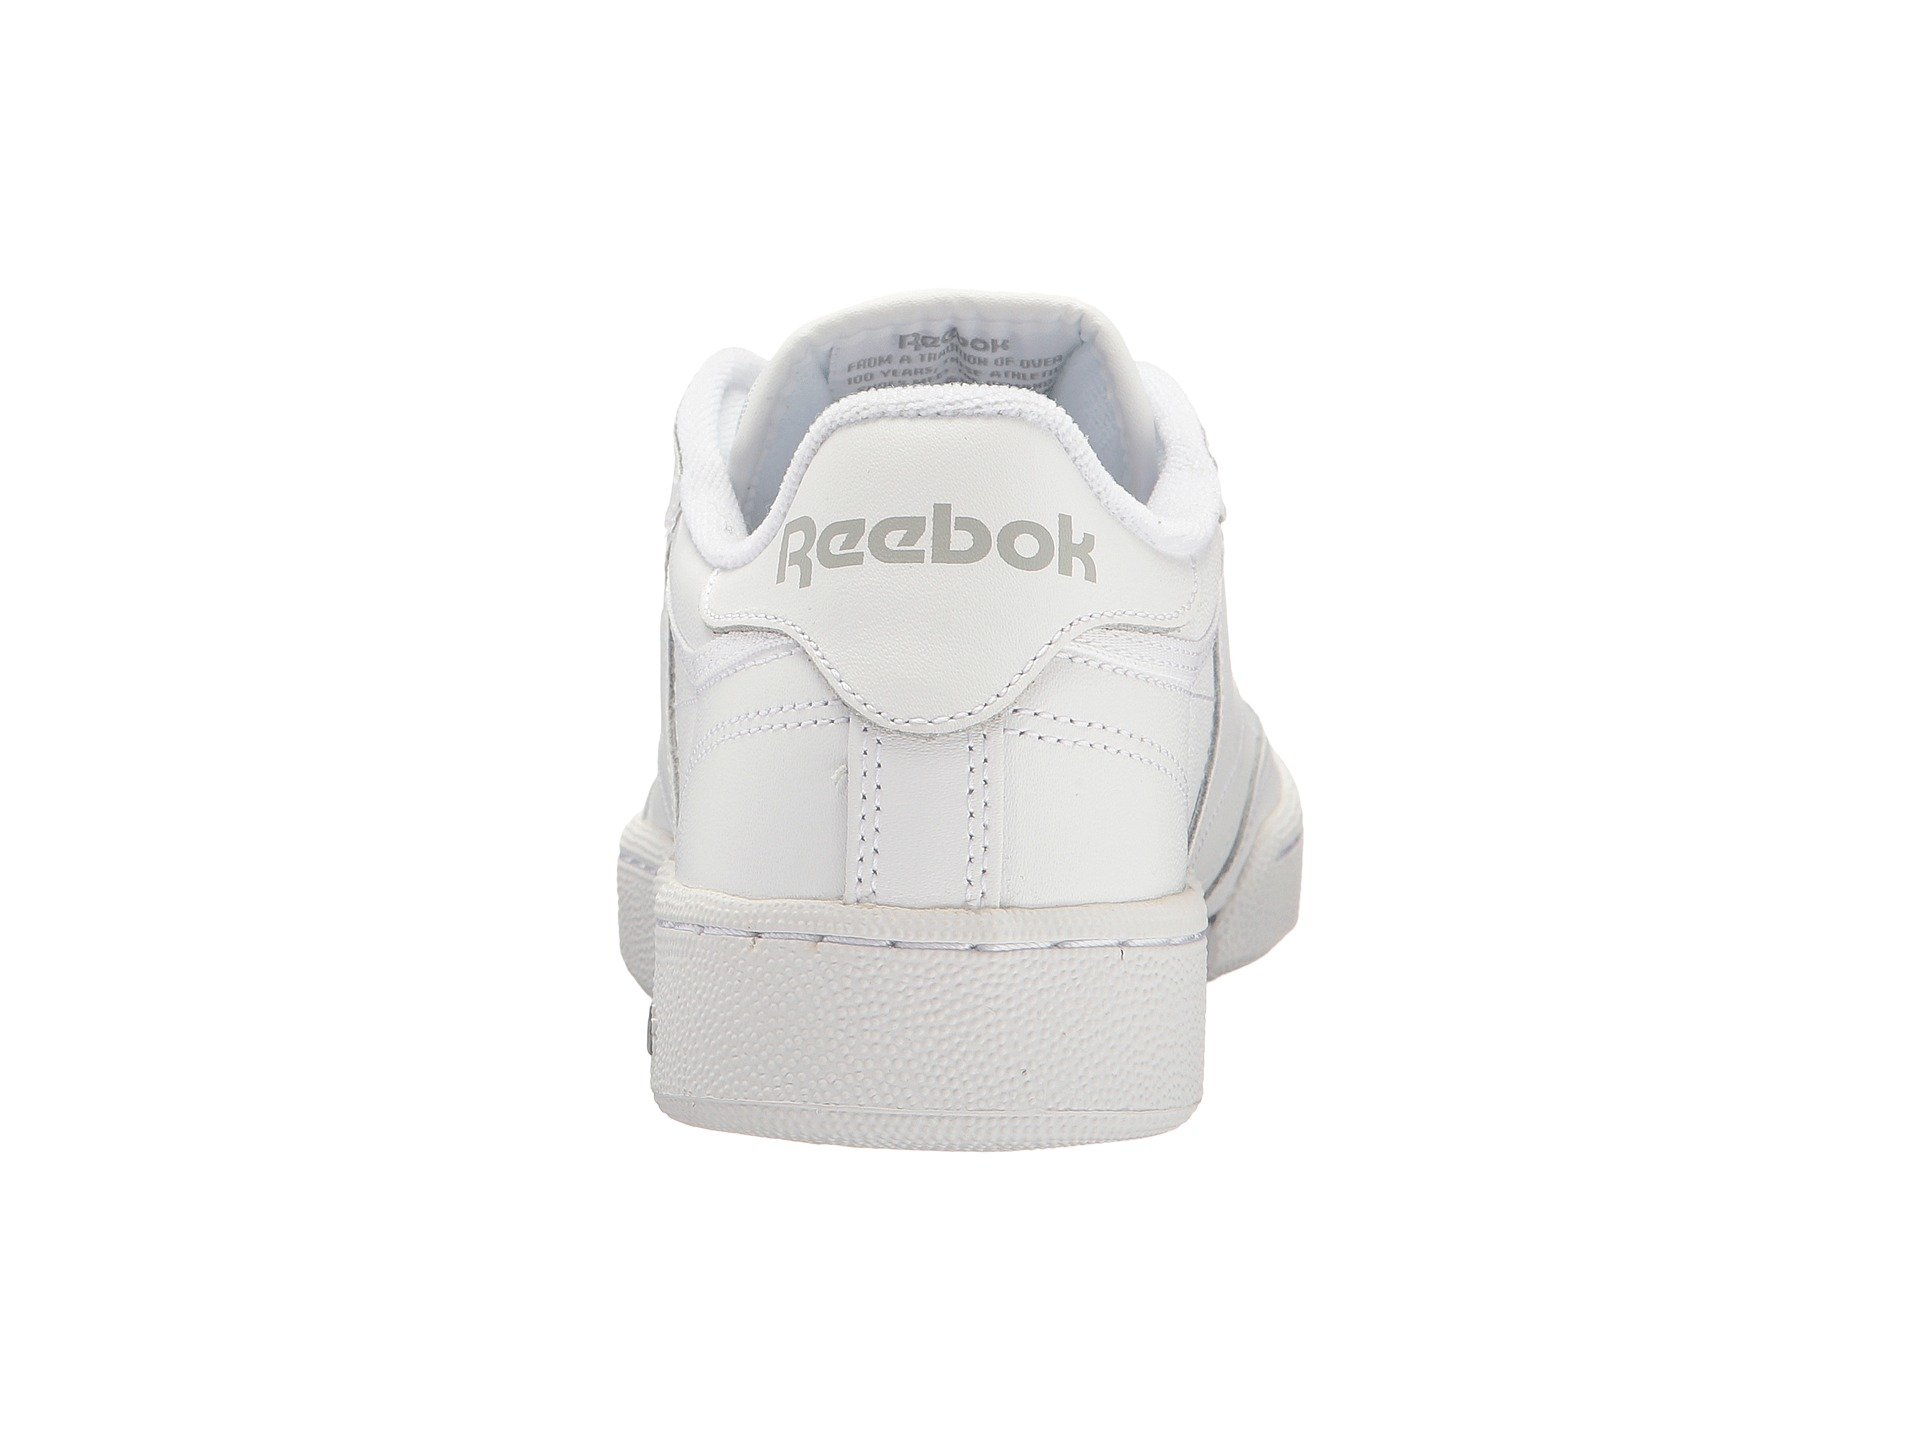 C Club Reebok sheer white 85 Int Grey Lifestyle FPFqxAw